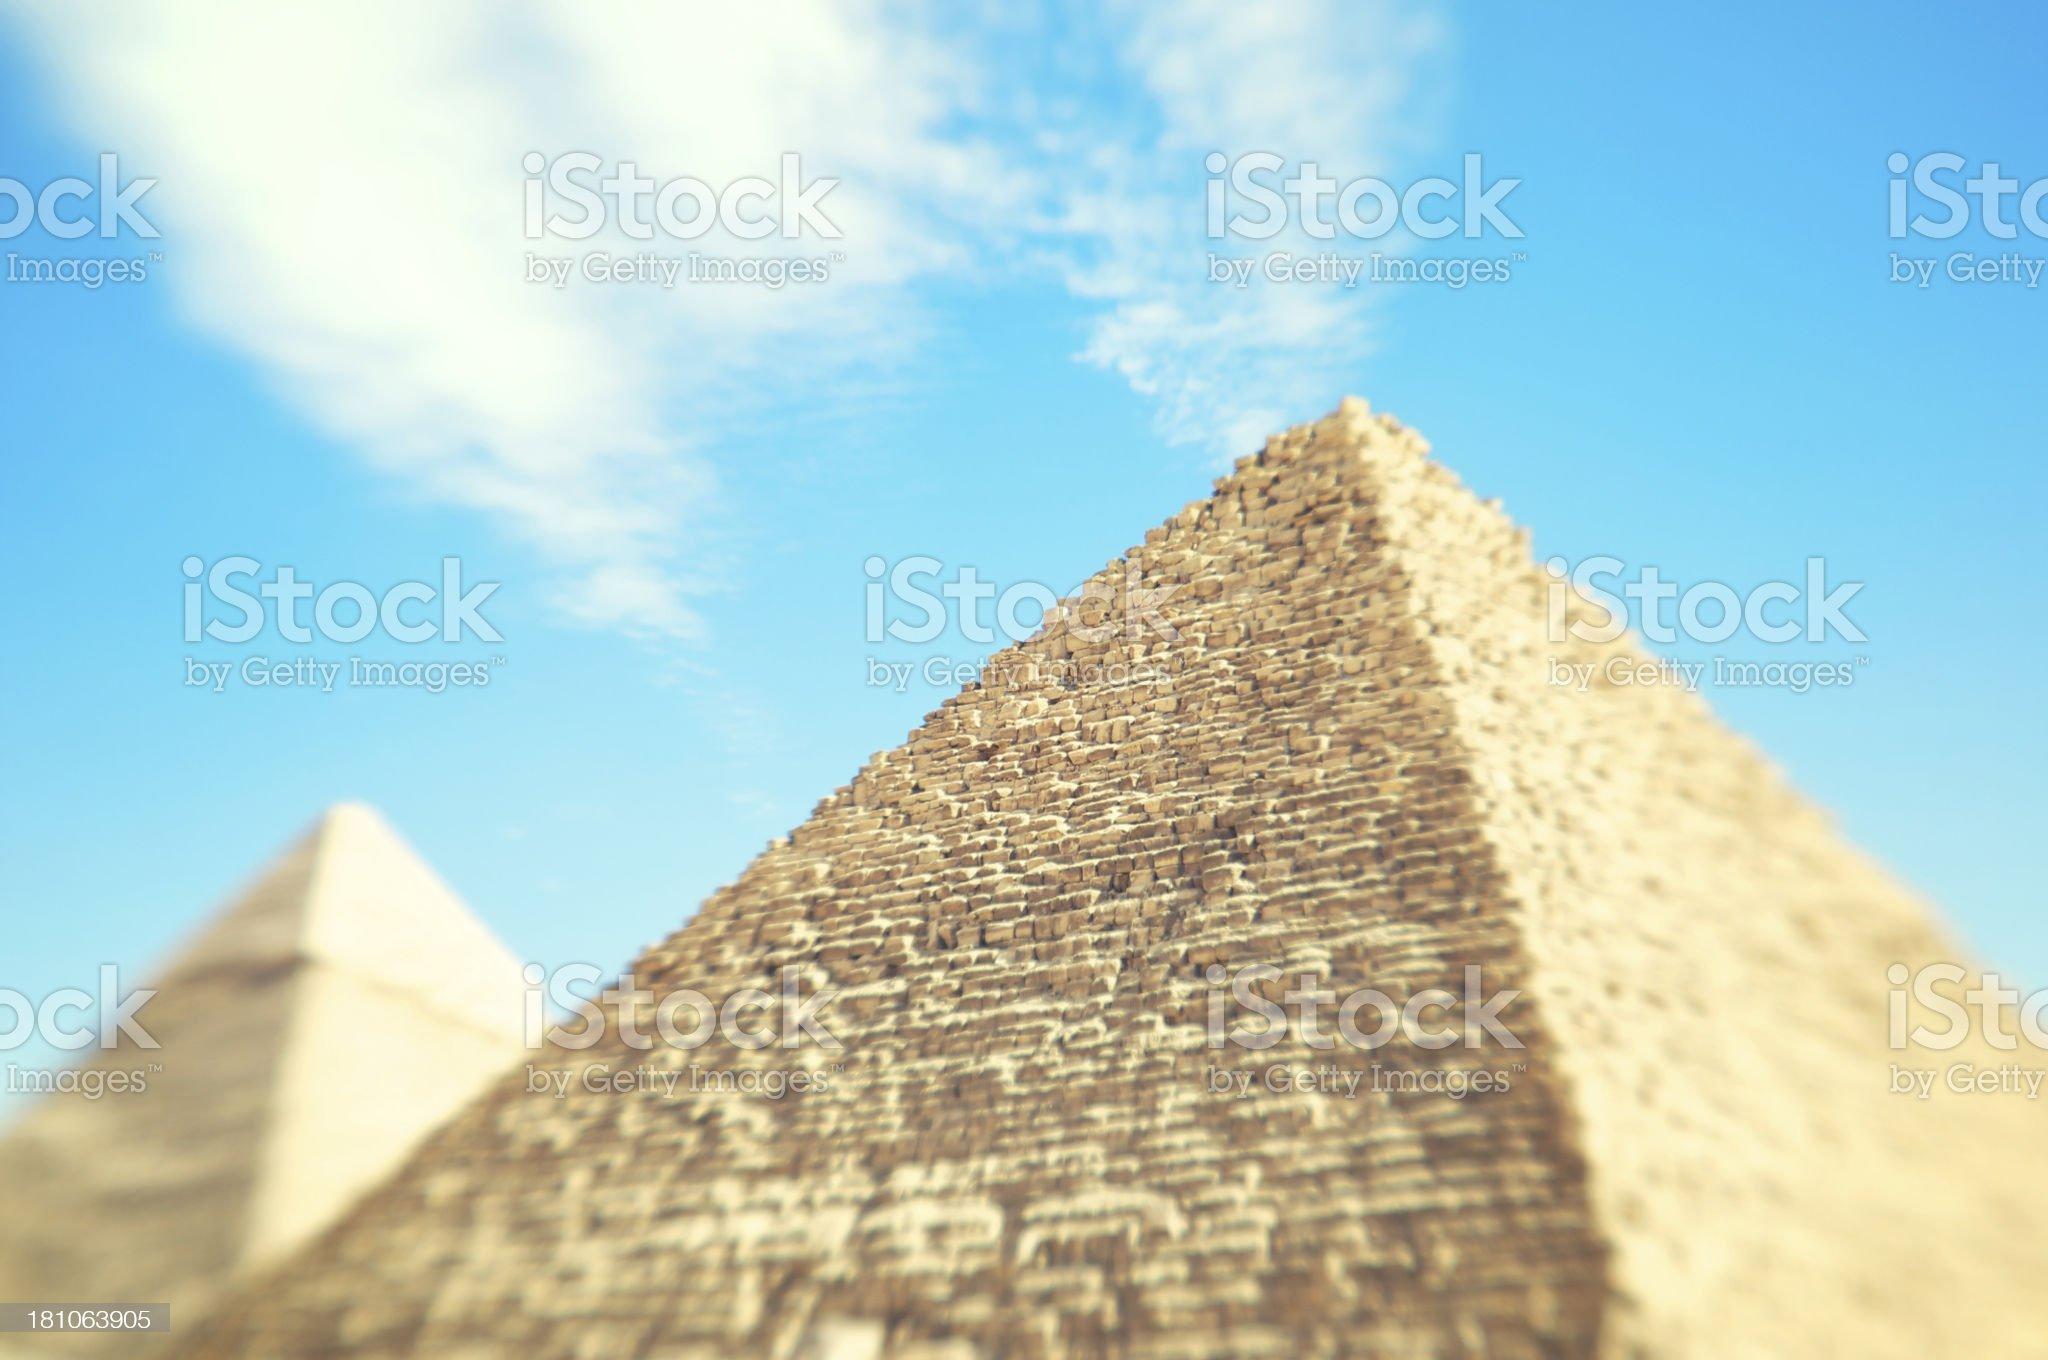 Egyptian Great Pyramids Selective Focus Bright Sky royalty-free stock photo